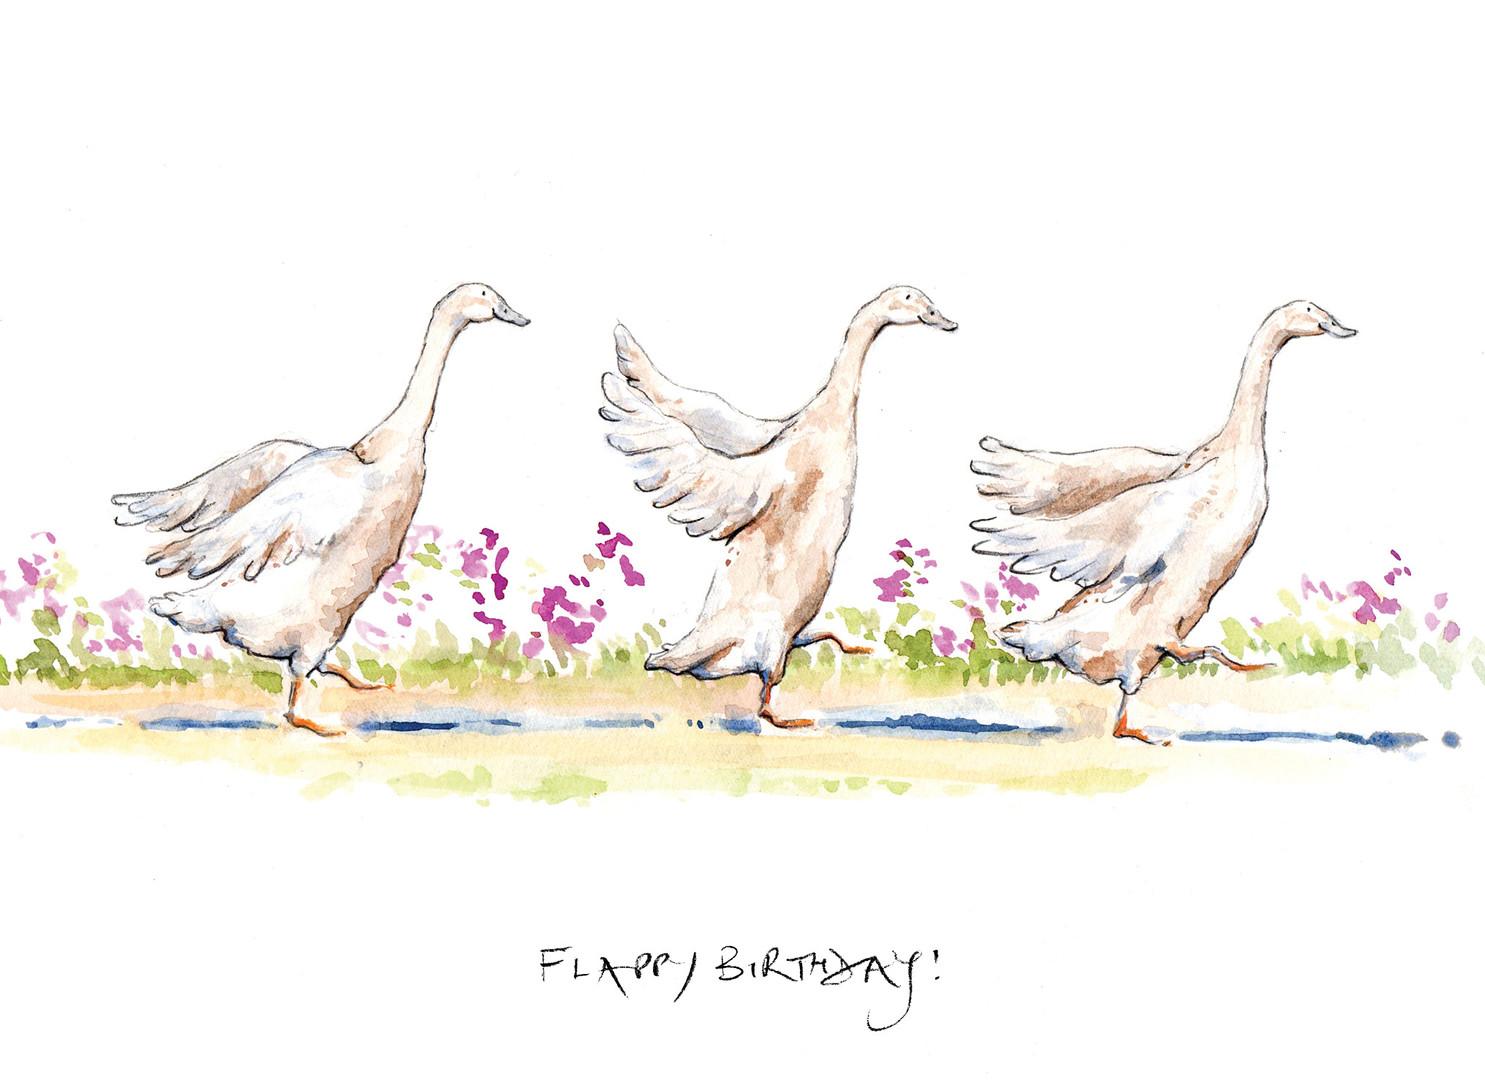 Flappy Birthday